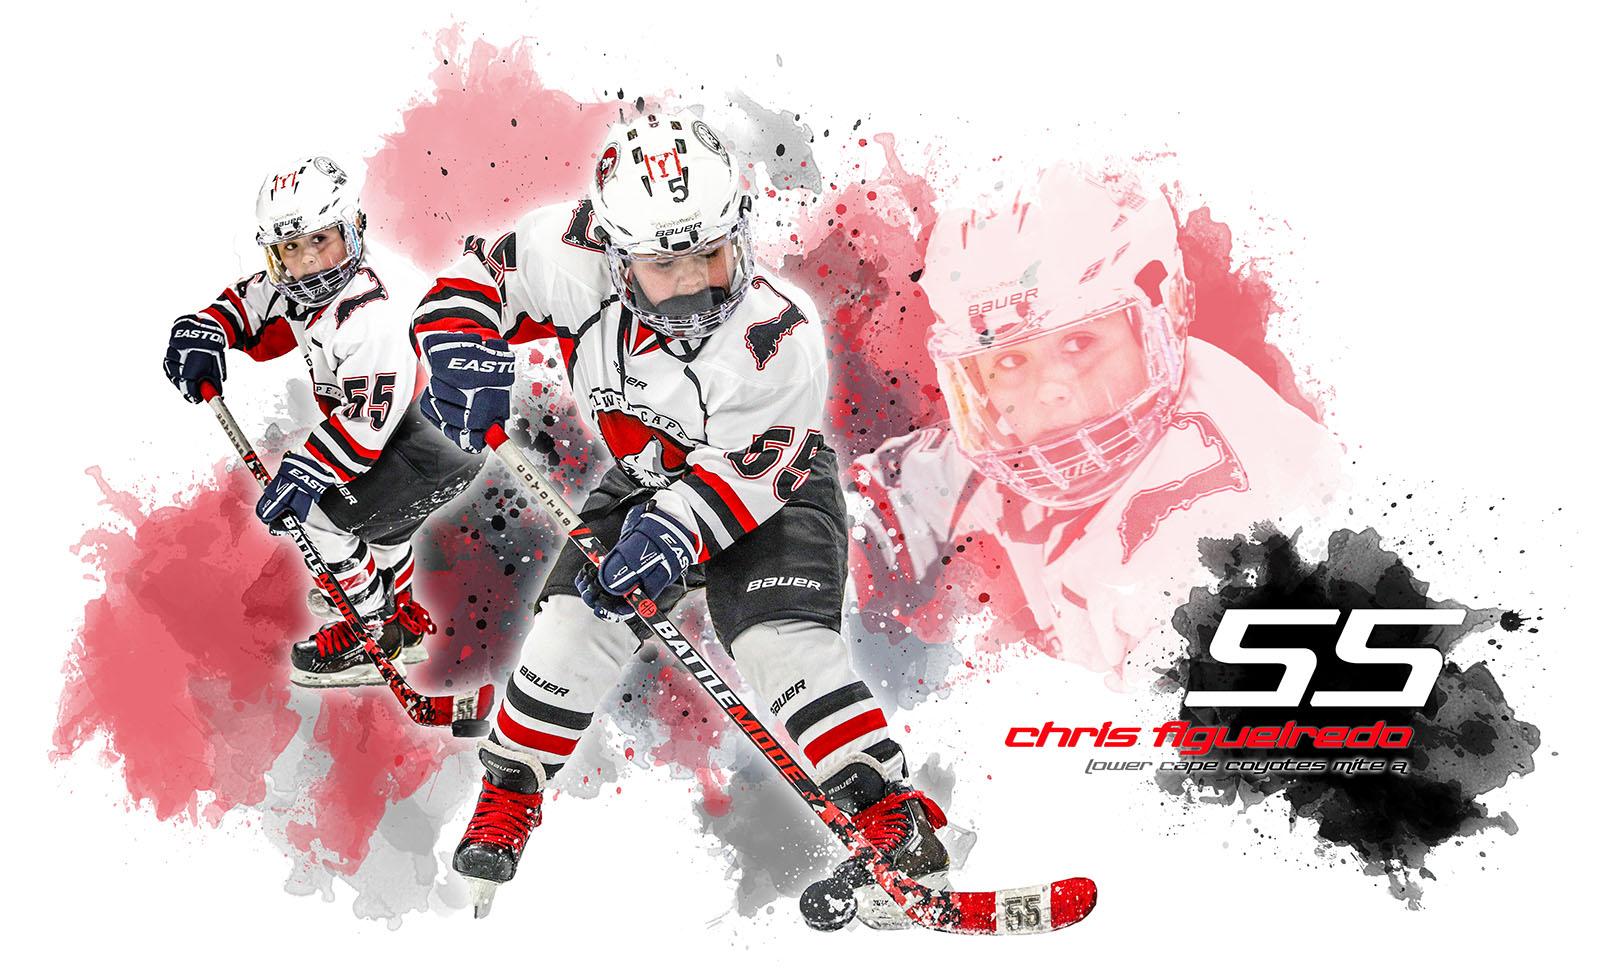 SilverPeak-Studios-Paint-Spatter-Hockey-Poster-Painting-Artwork-Sportrait-Player-Coyotes-Low-Res